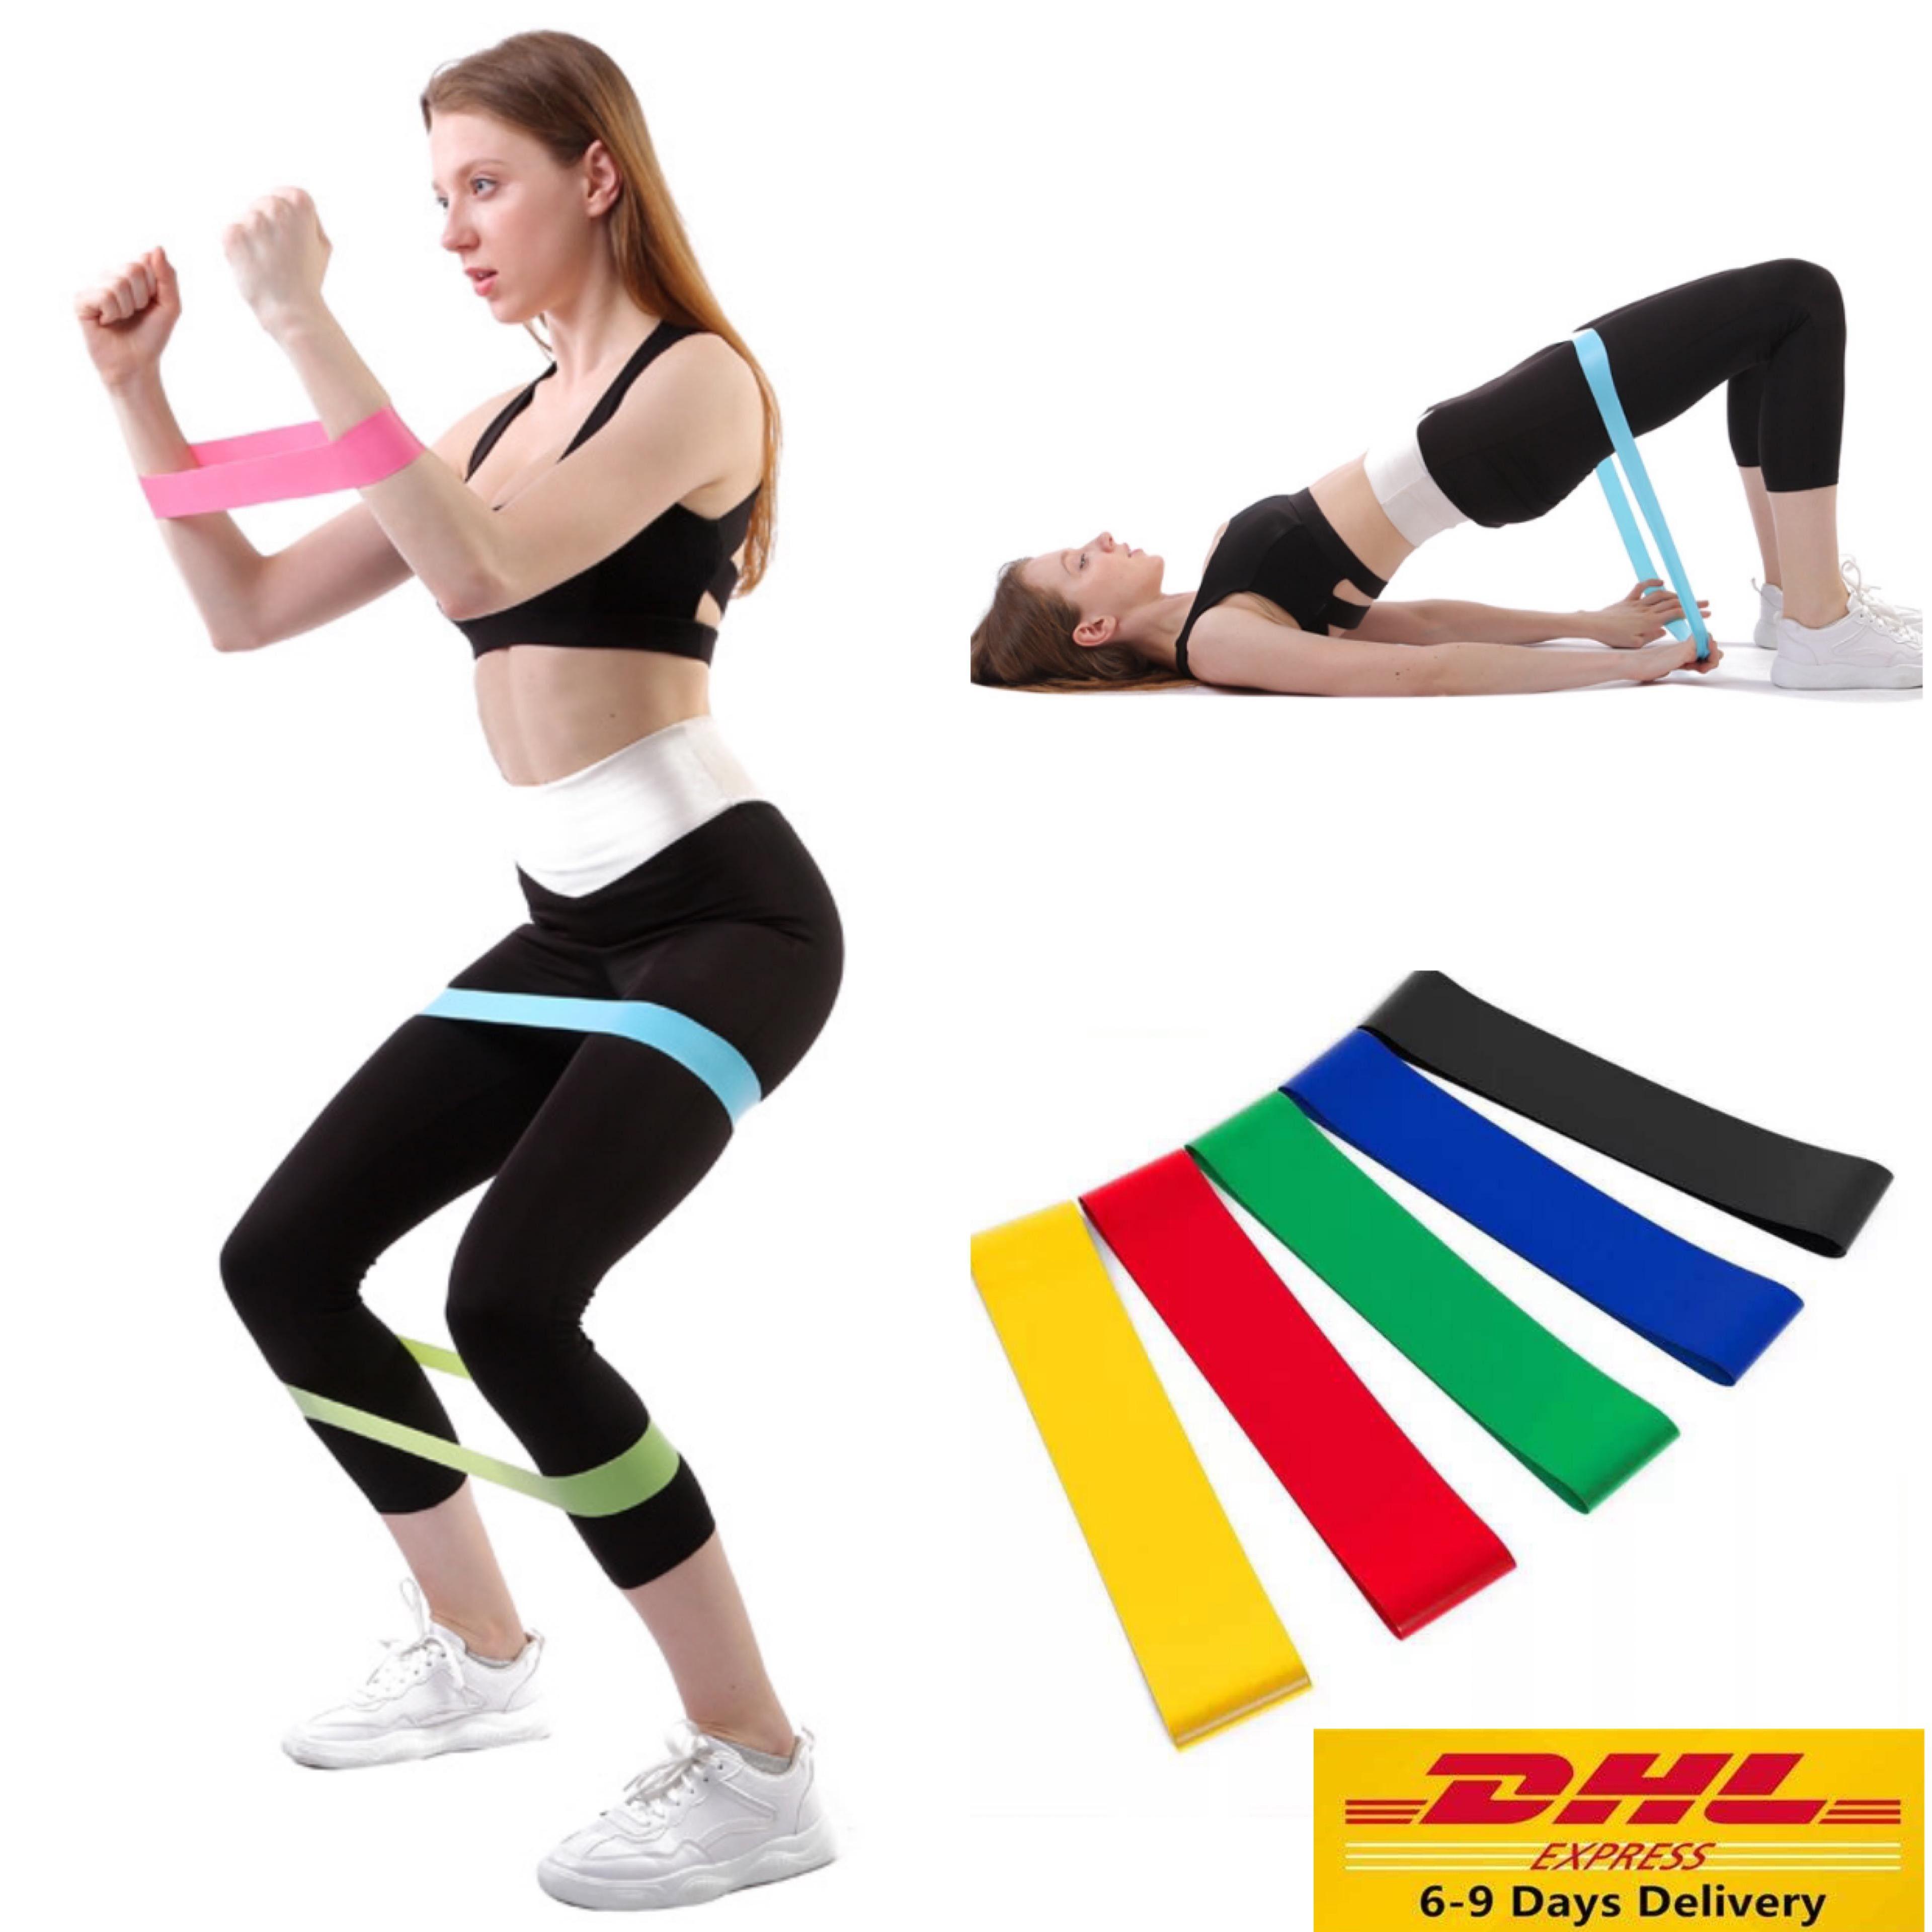 Tanztraining Fitness Pilates Yoga Elastic Stretch Resistance Band